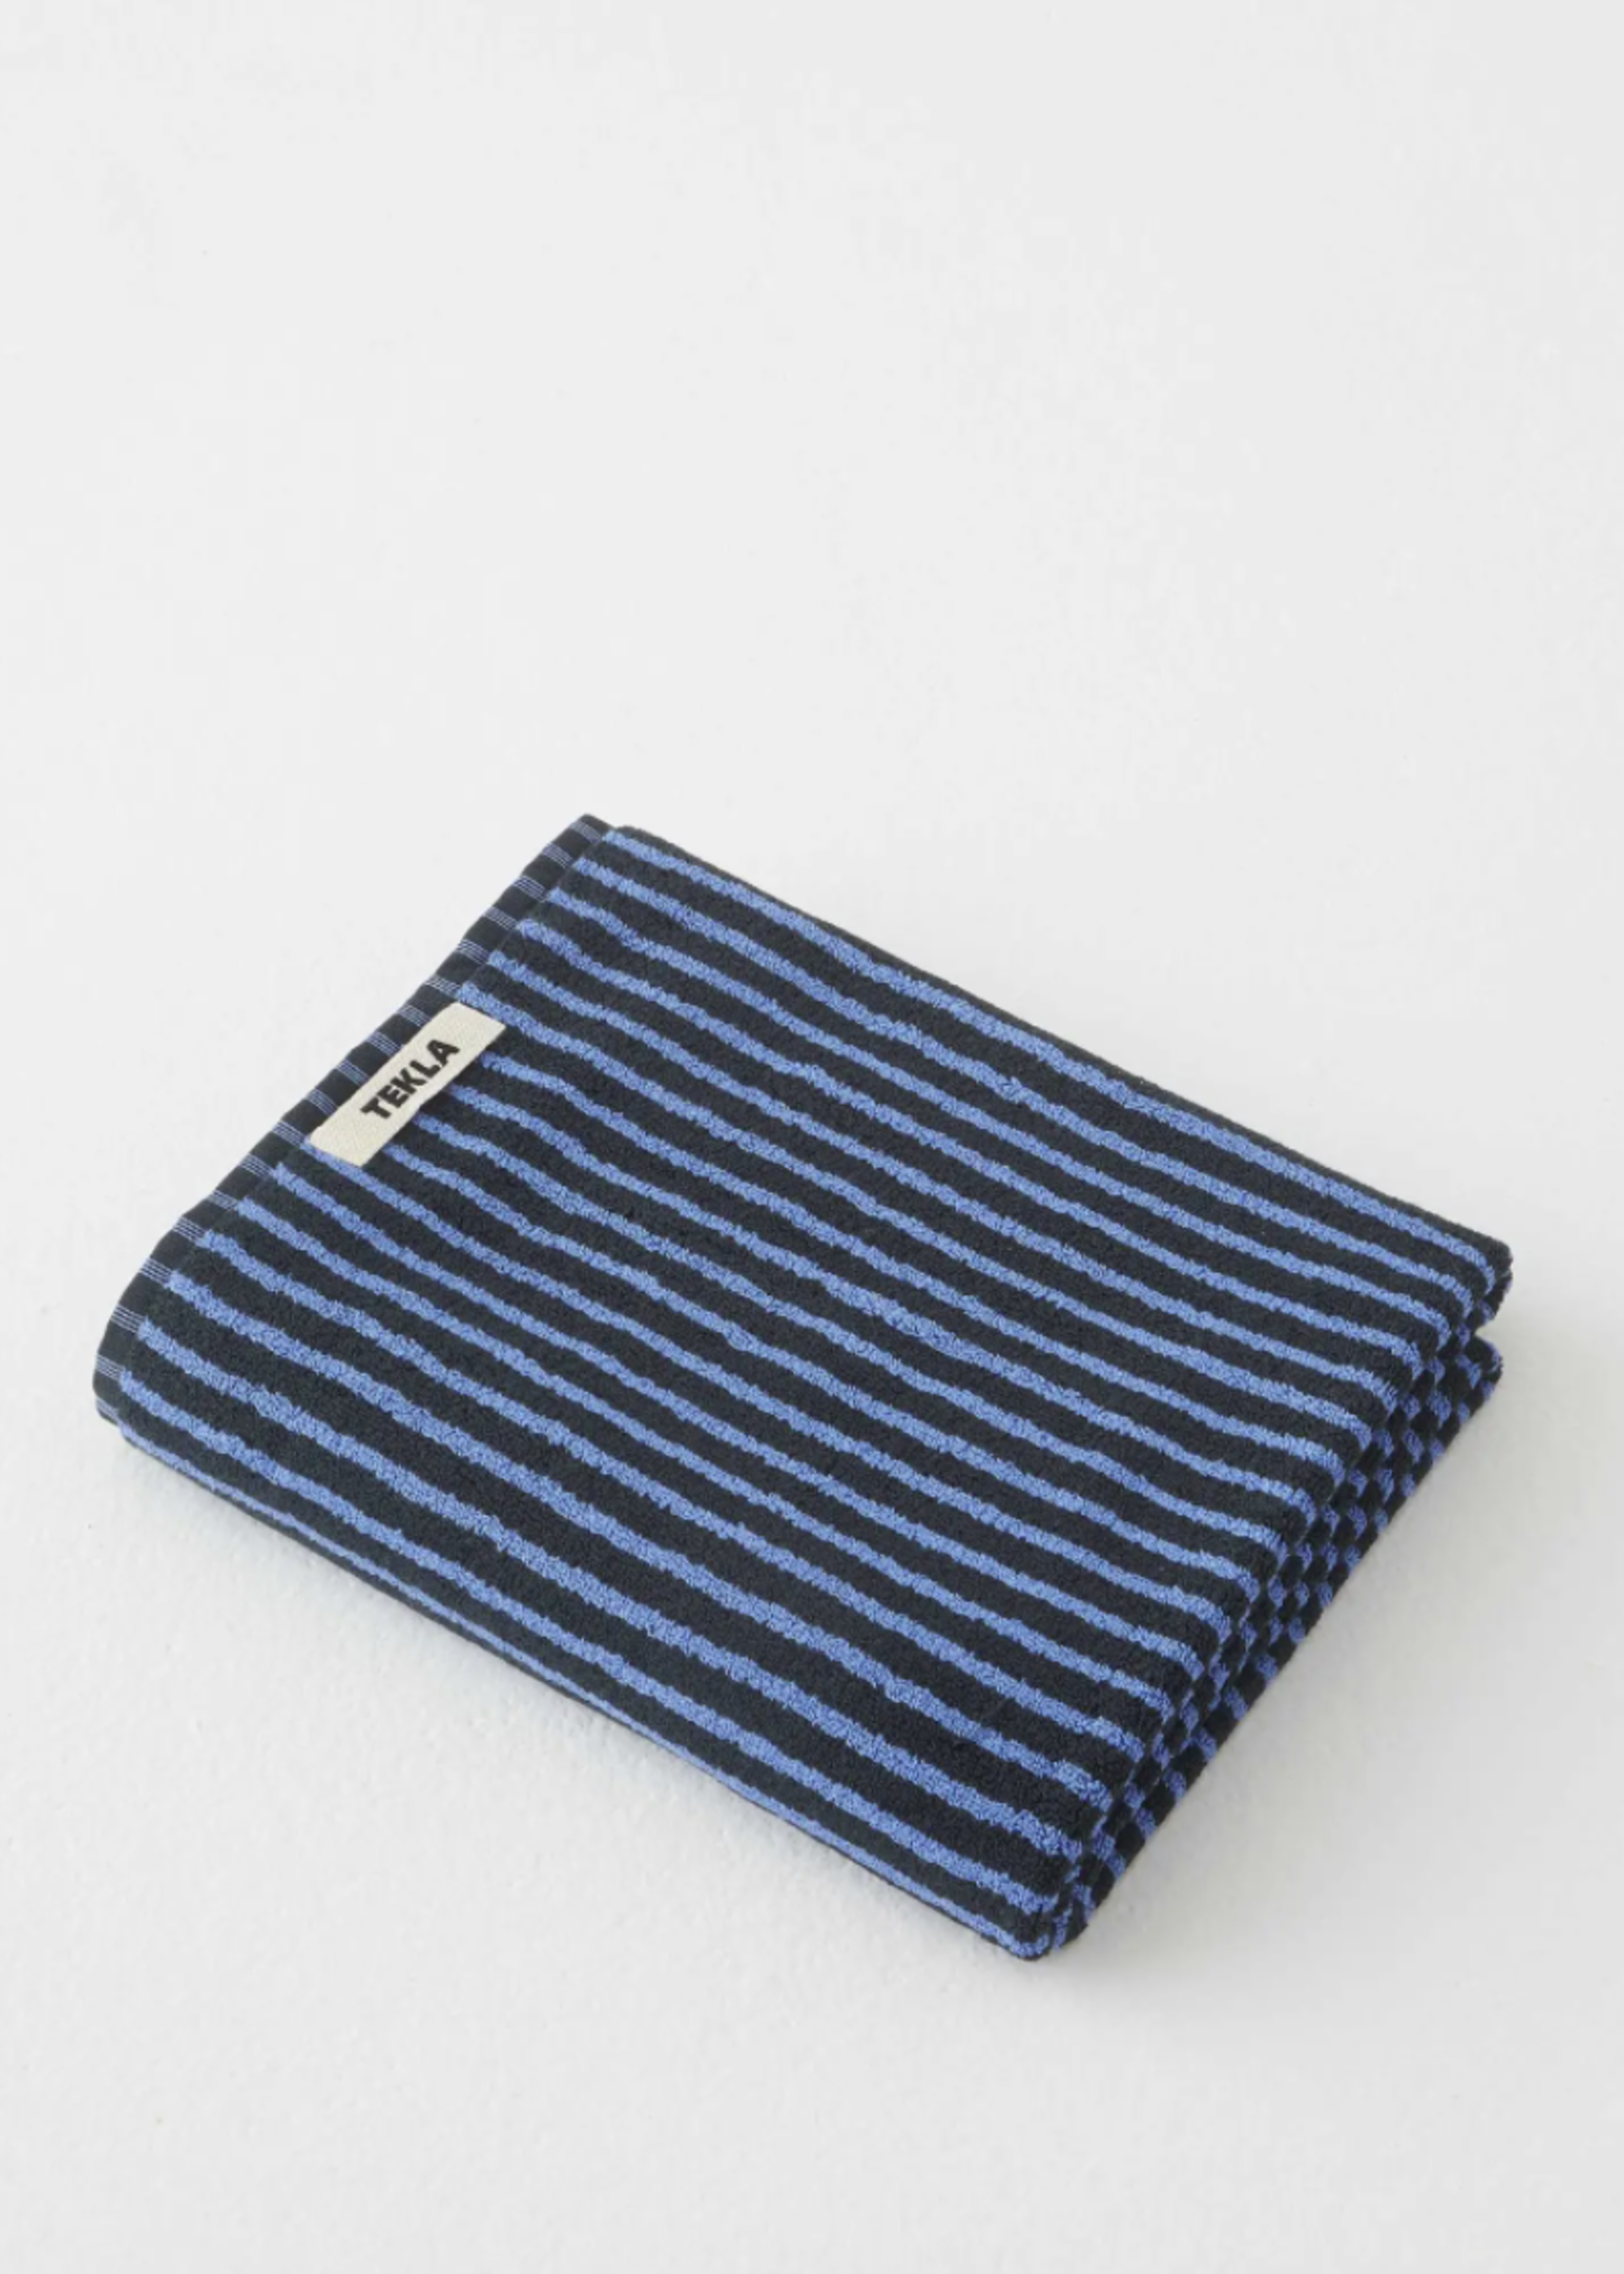 TEKLA Organic Bath Towel in Black and Blue Stripe